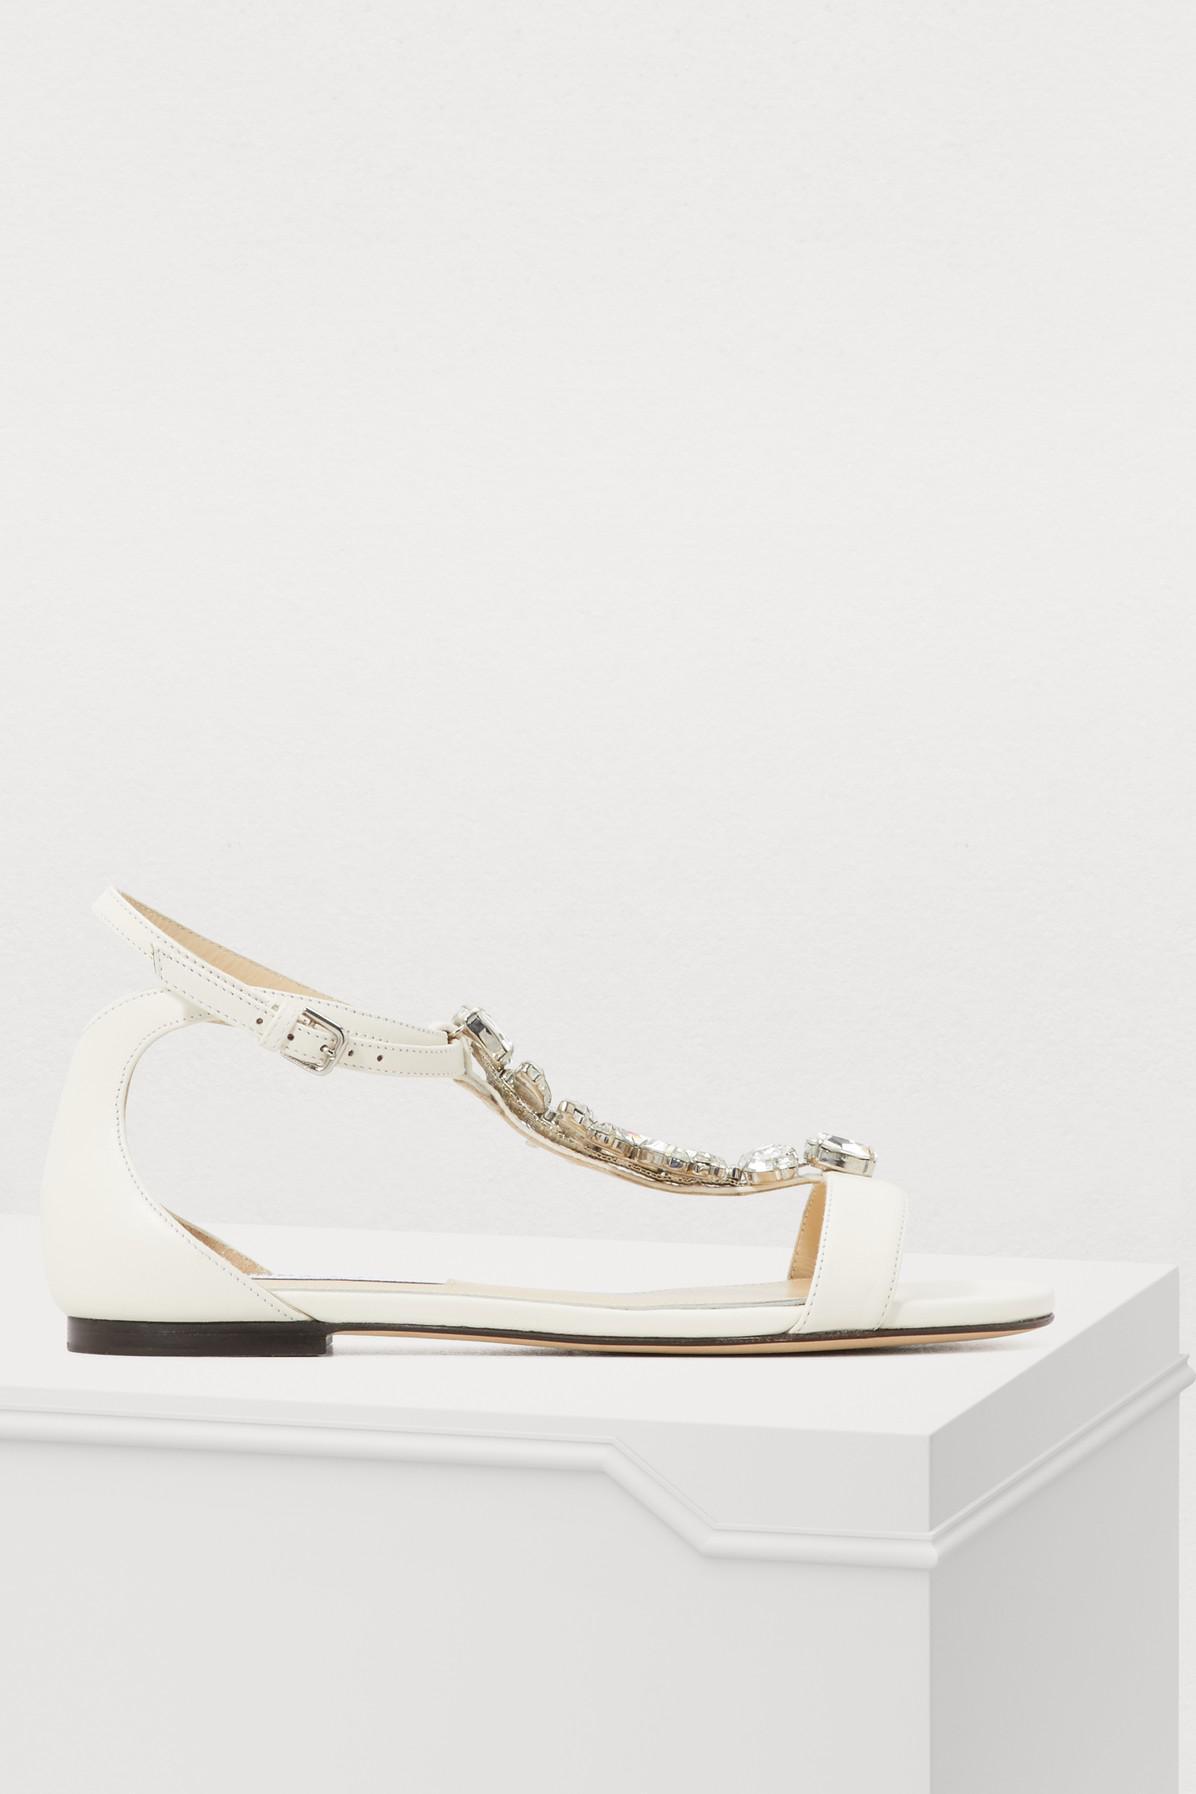 2ac9ee013ed2 Lyst - Jimmy Choo Averie Sandals in Metallic